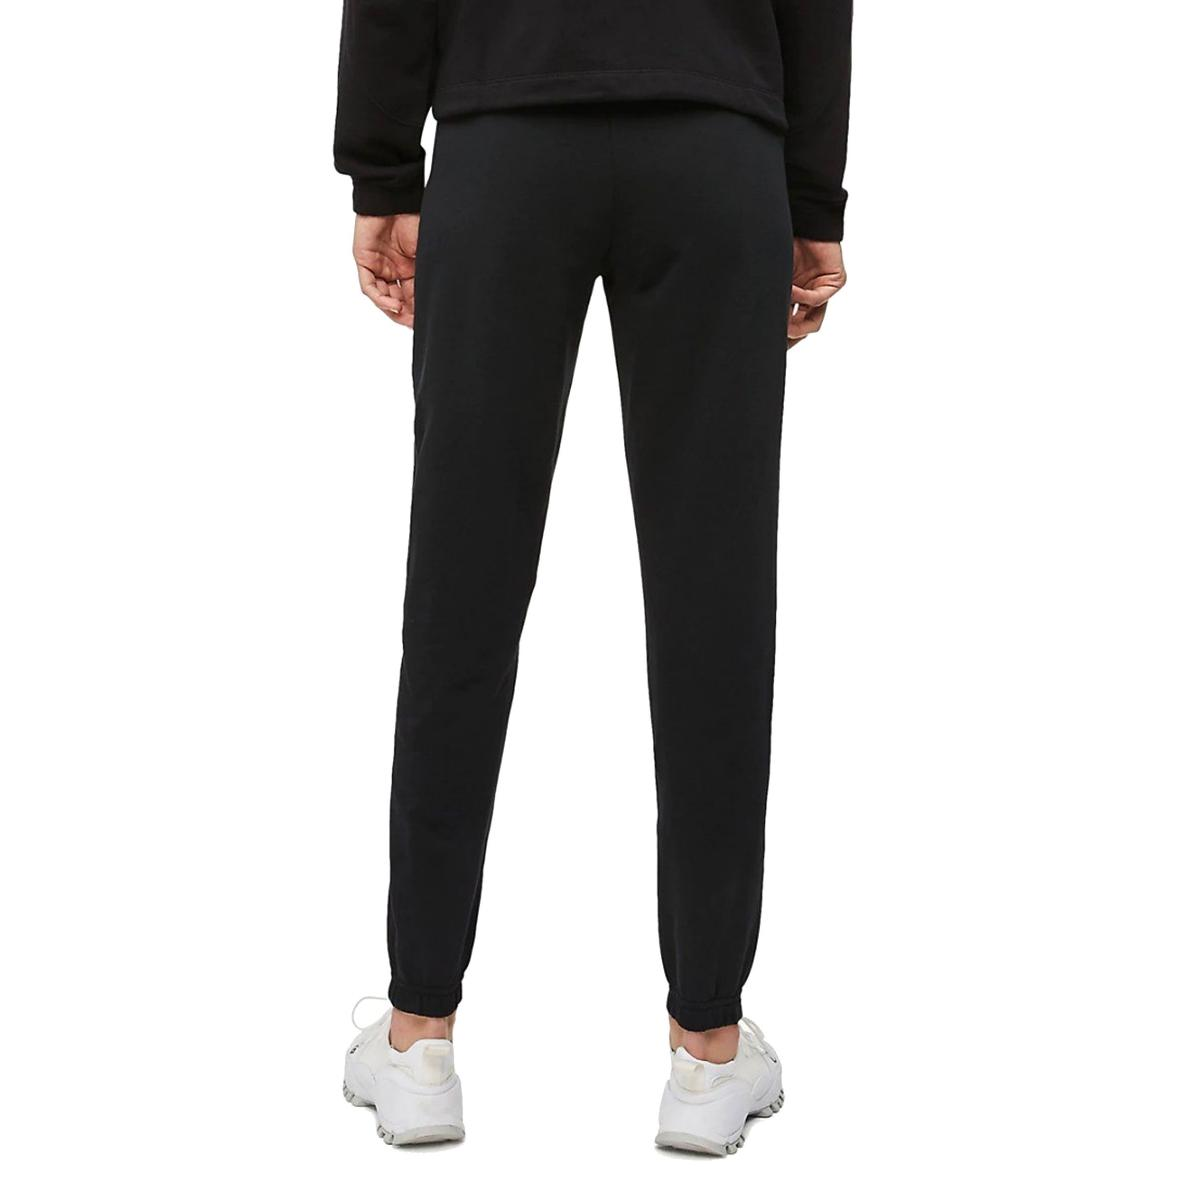 Pantaloni Calvin Klein Performance in tuta da donna rif. 00GWF9P614